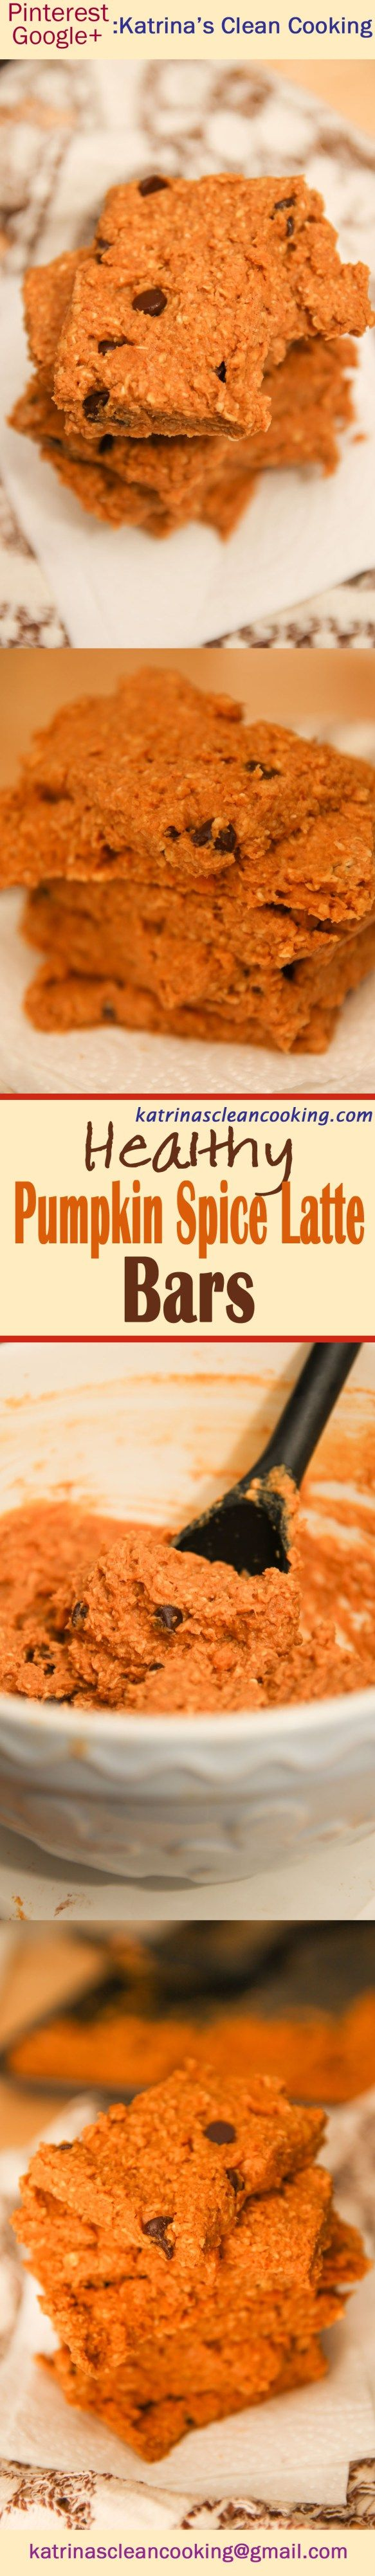 Healthy Pumpkin Spice Latte Energy Bars #healthy #glutenfree #vegan